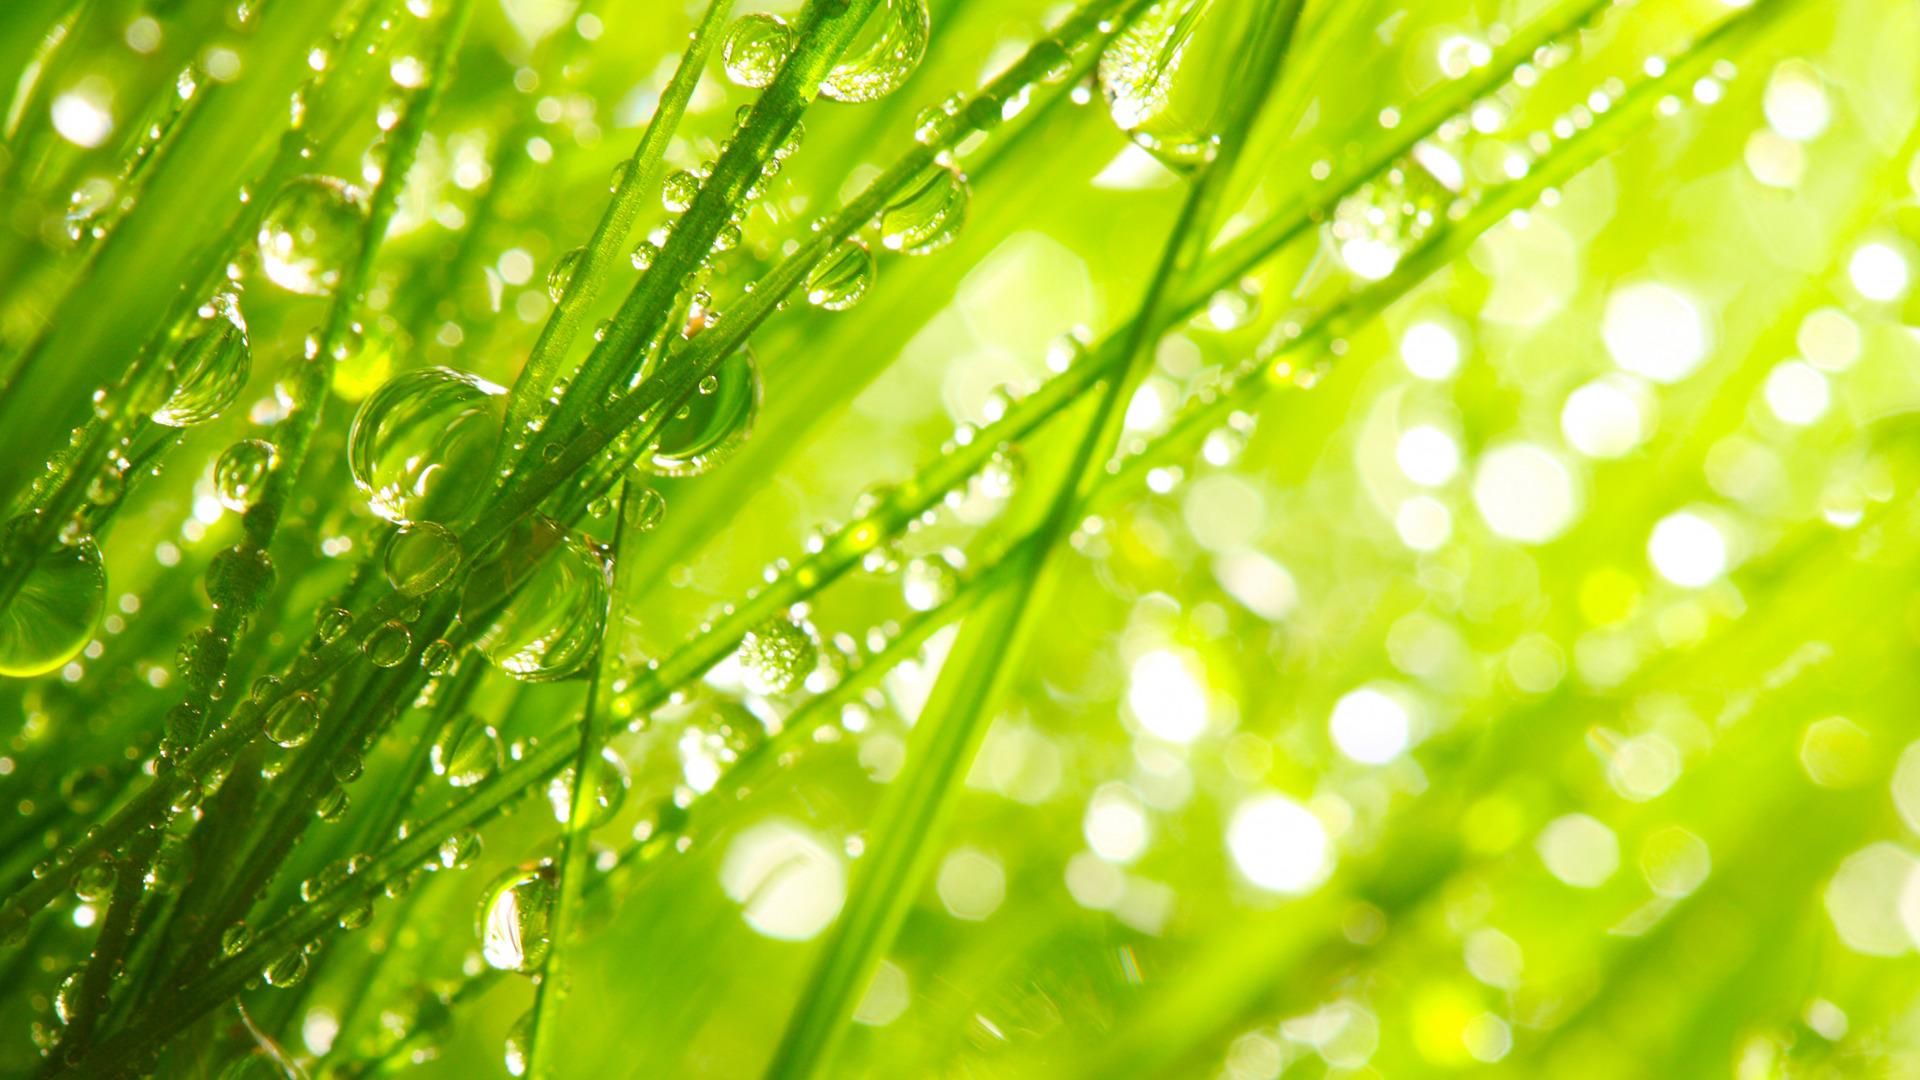 Картинки на рабочий стол трава зеленая